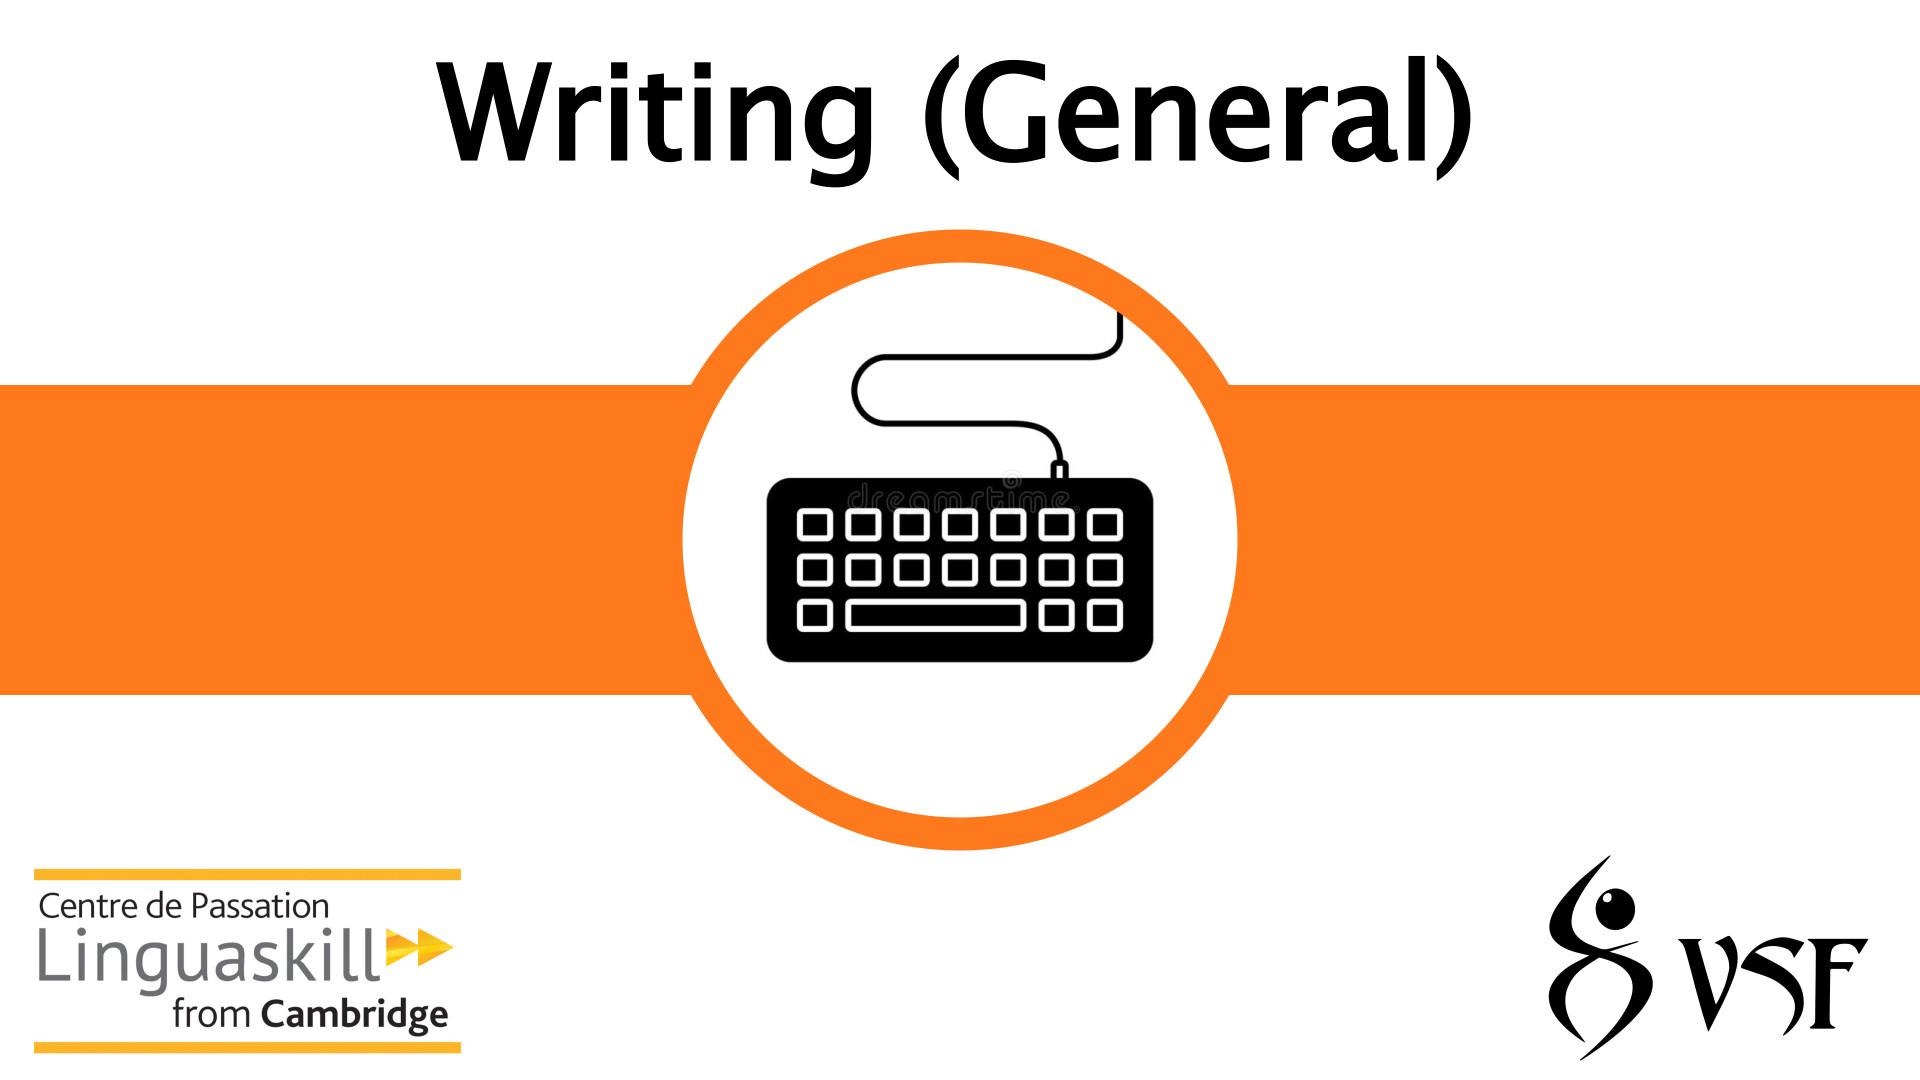 V1- Writing (General)